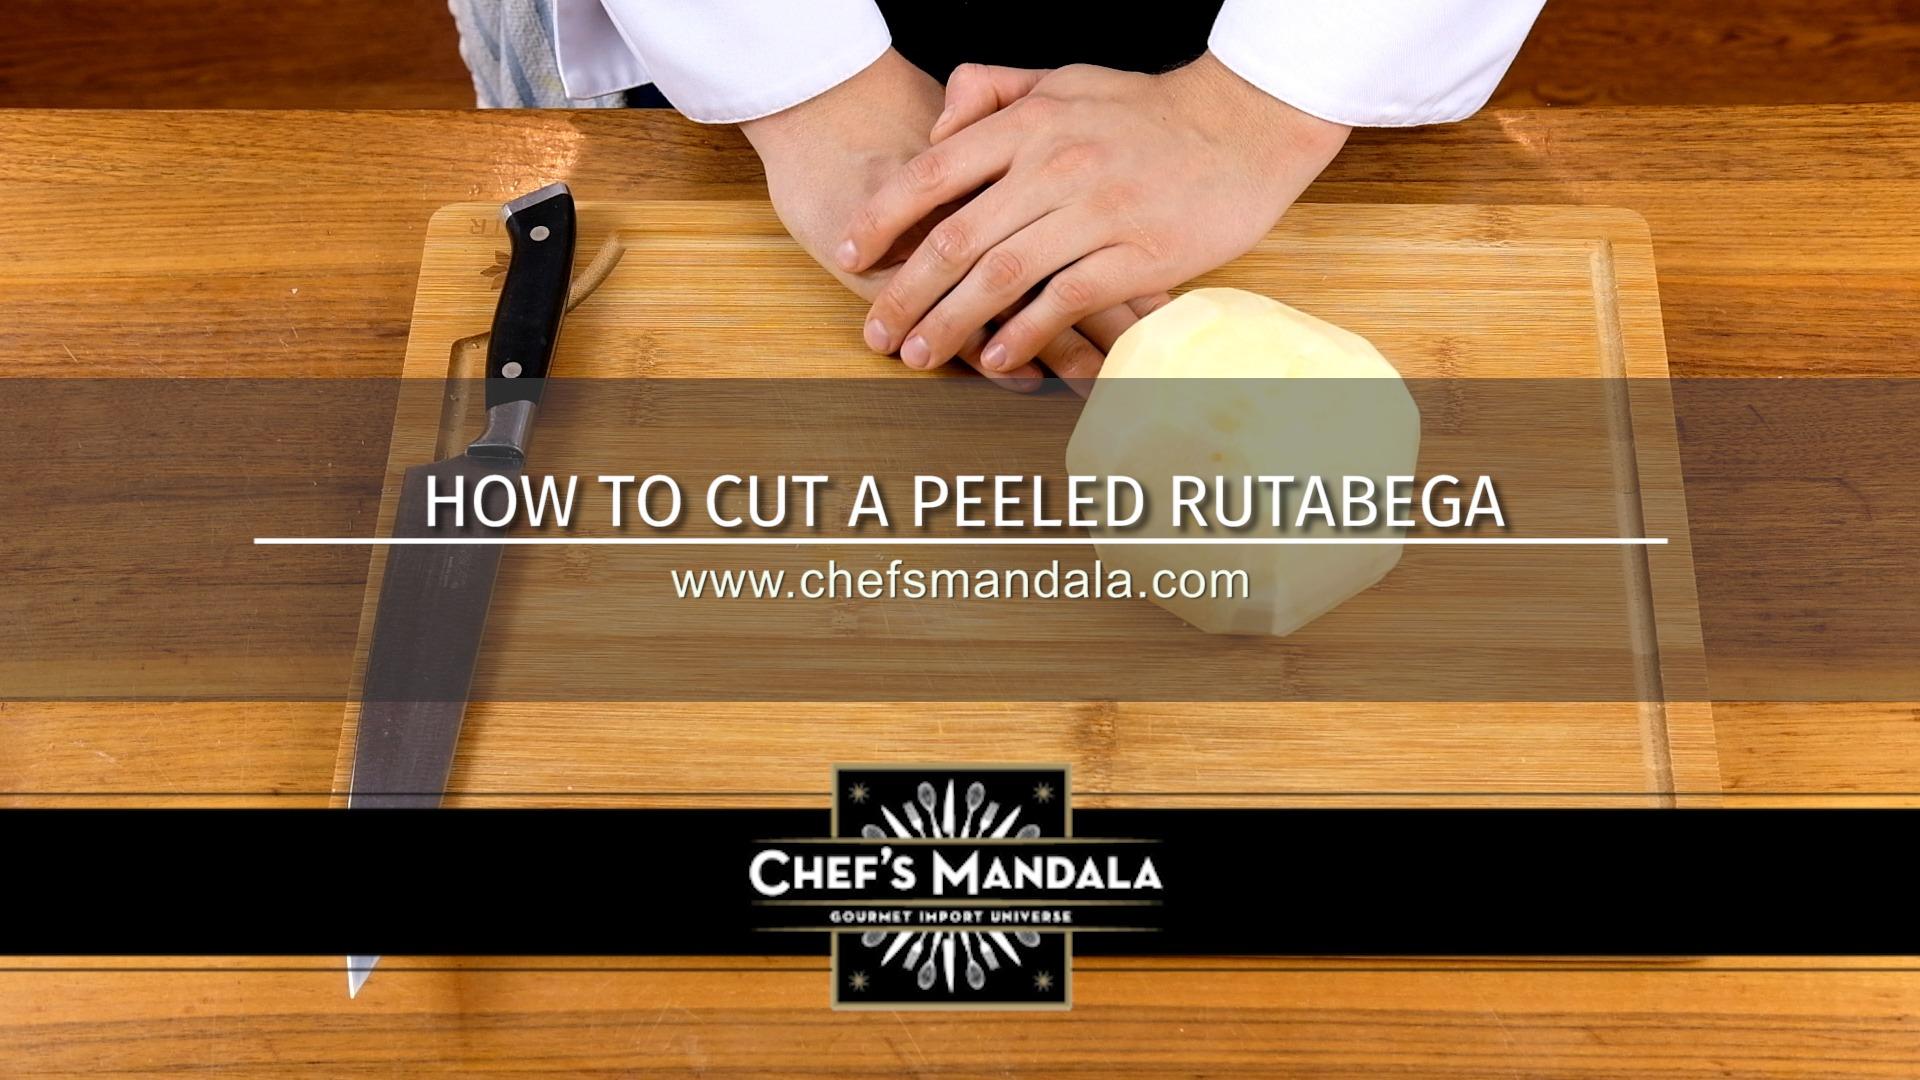 HOW TO CUT A PEELED RUTABAGA